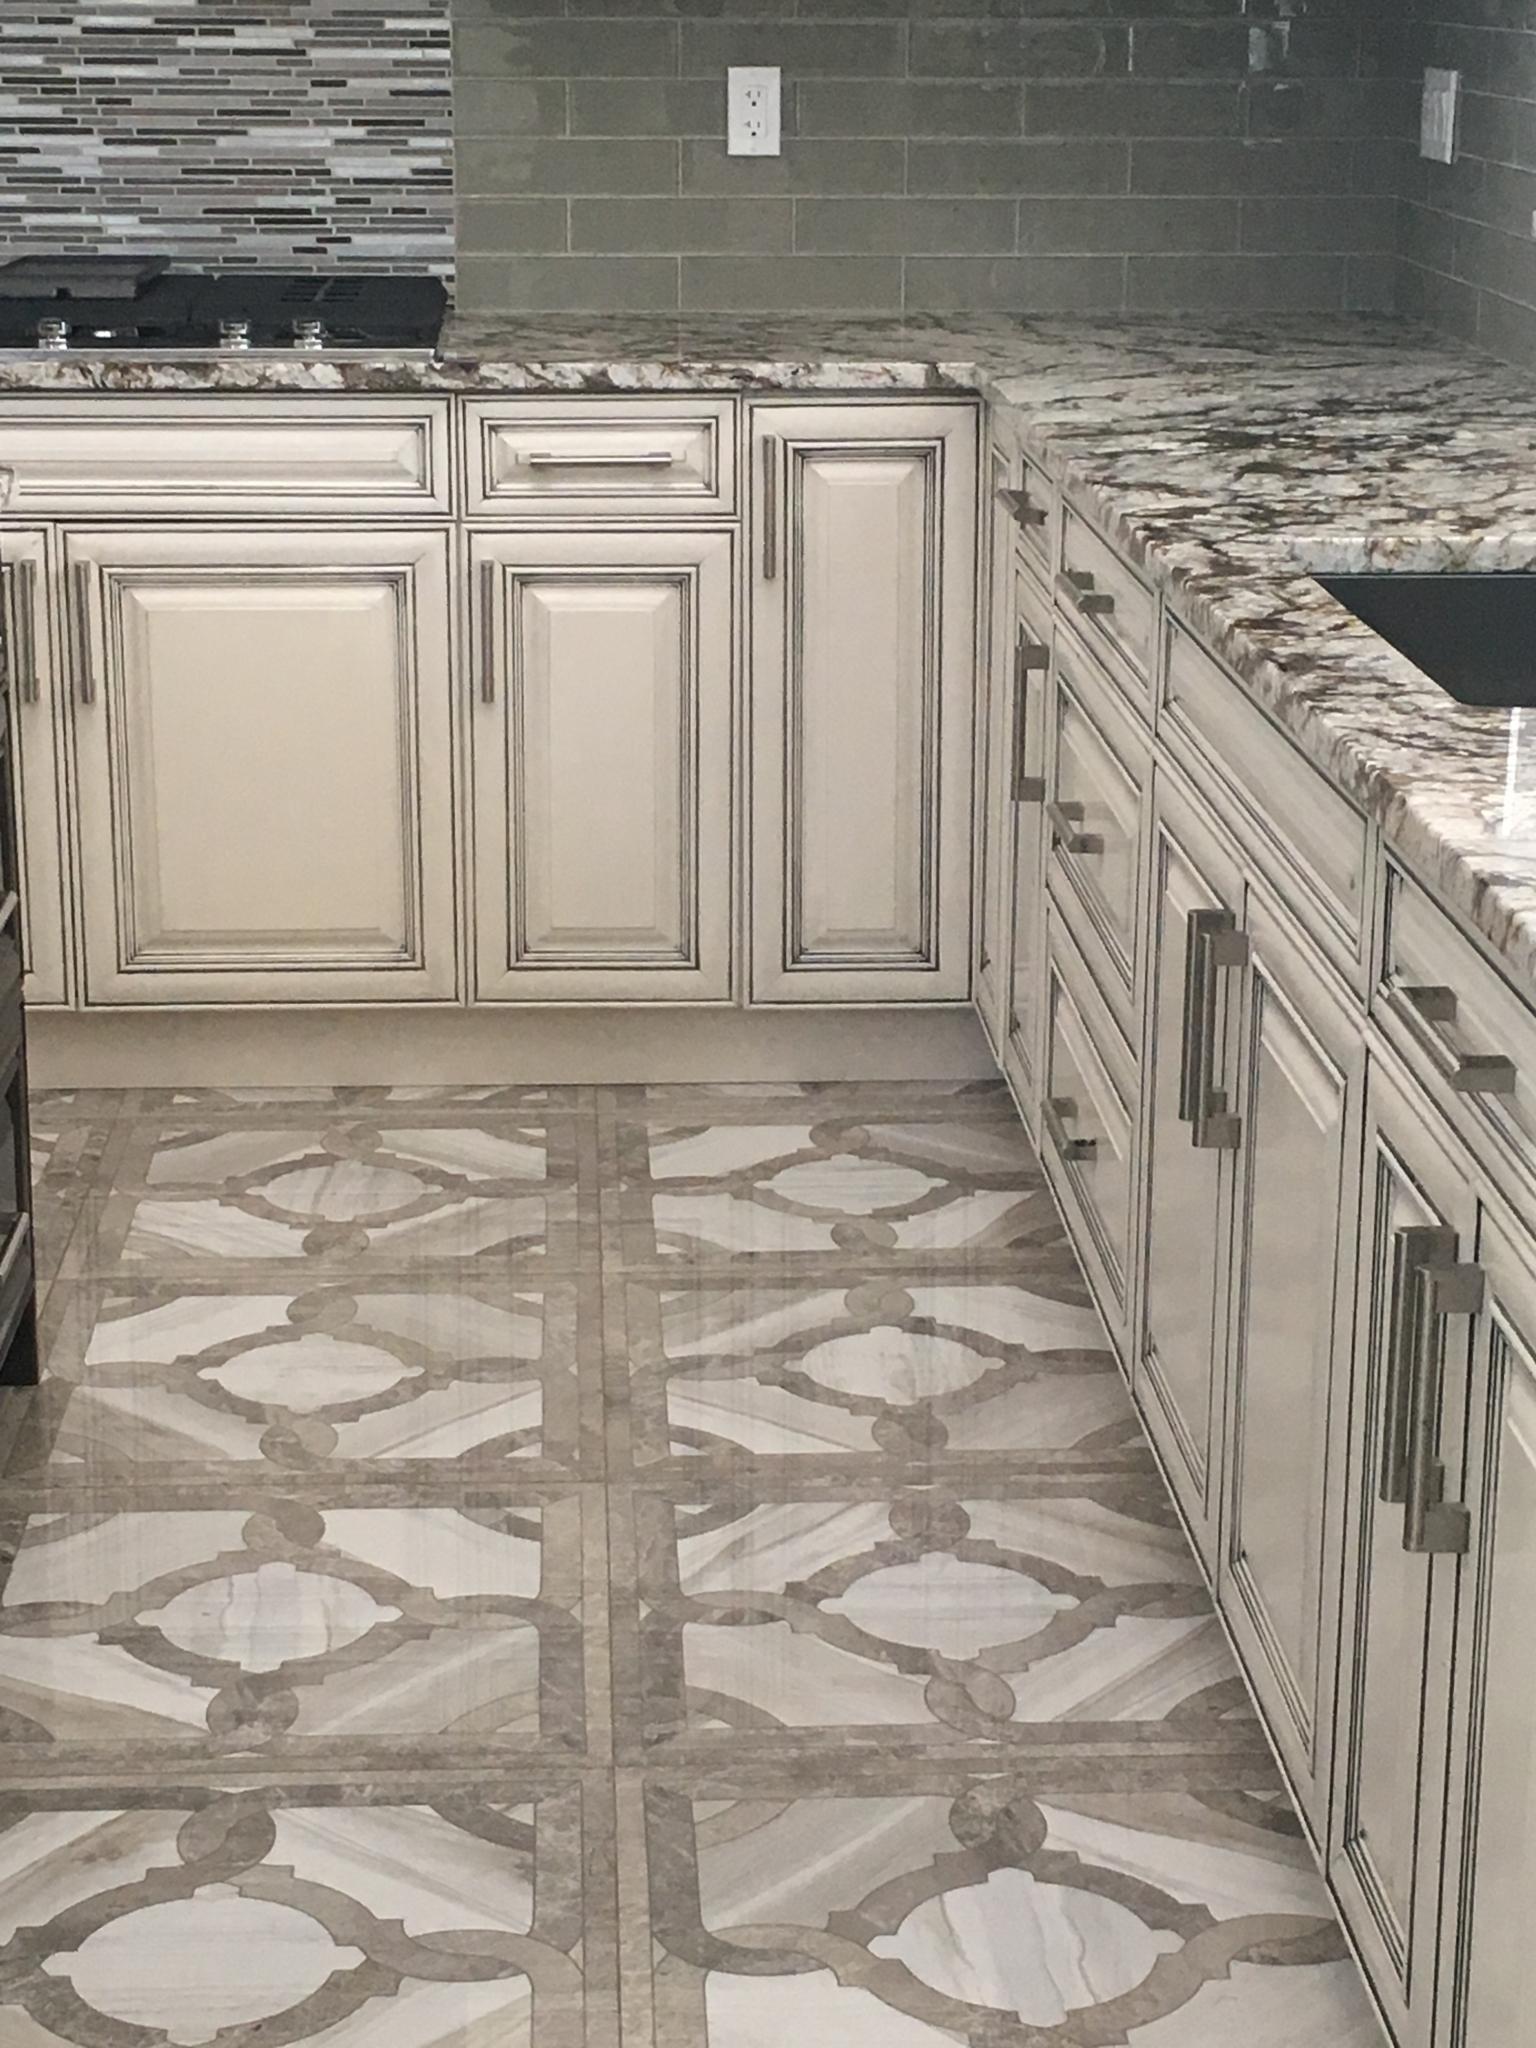 Ceramic tile distributors aberdeen choice image tile flooring ceramic tile suppliers tile distributors images tile flooring ceramic tile distributors aberdeen images tile flooring design dailygadgetfo Choice Image